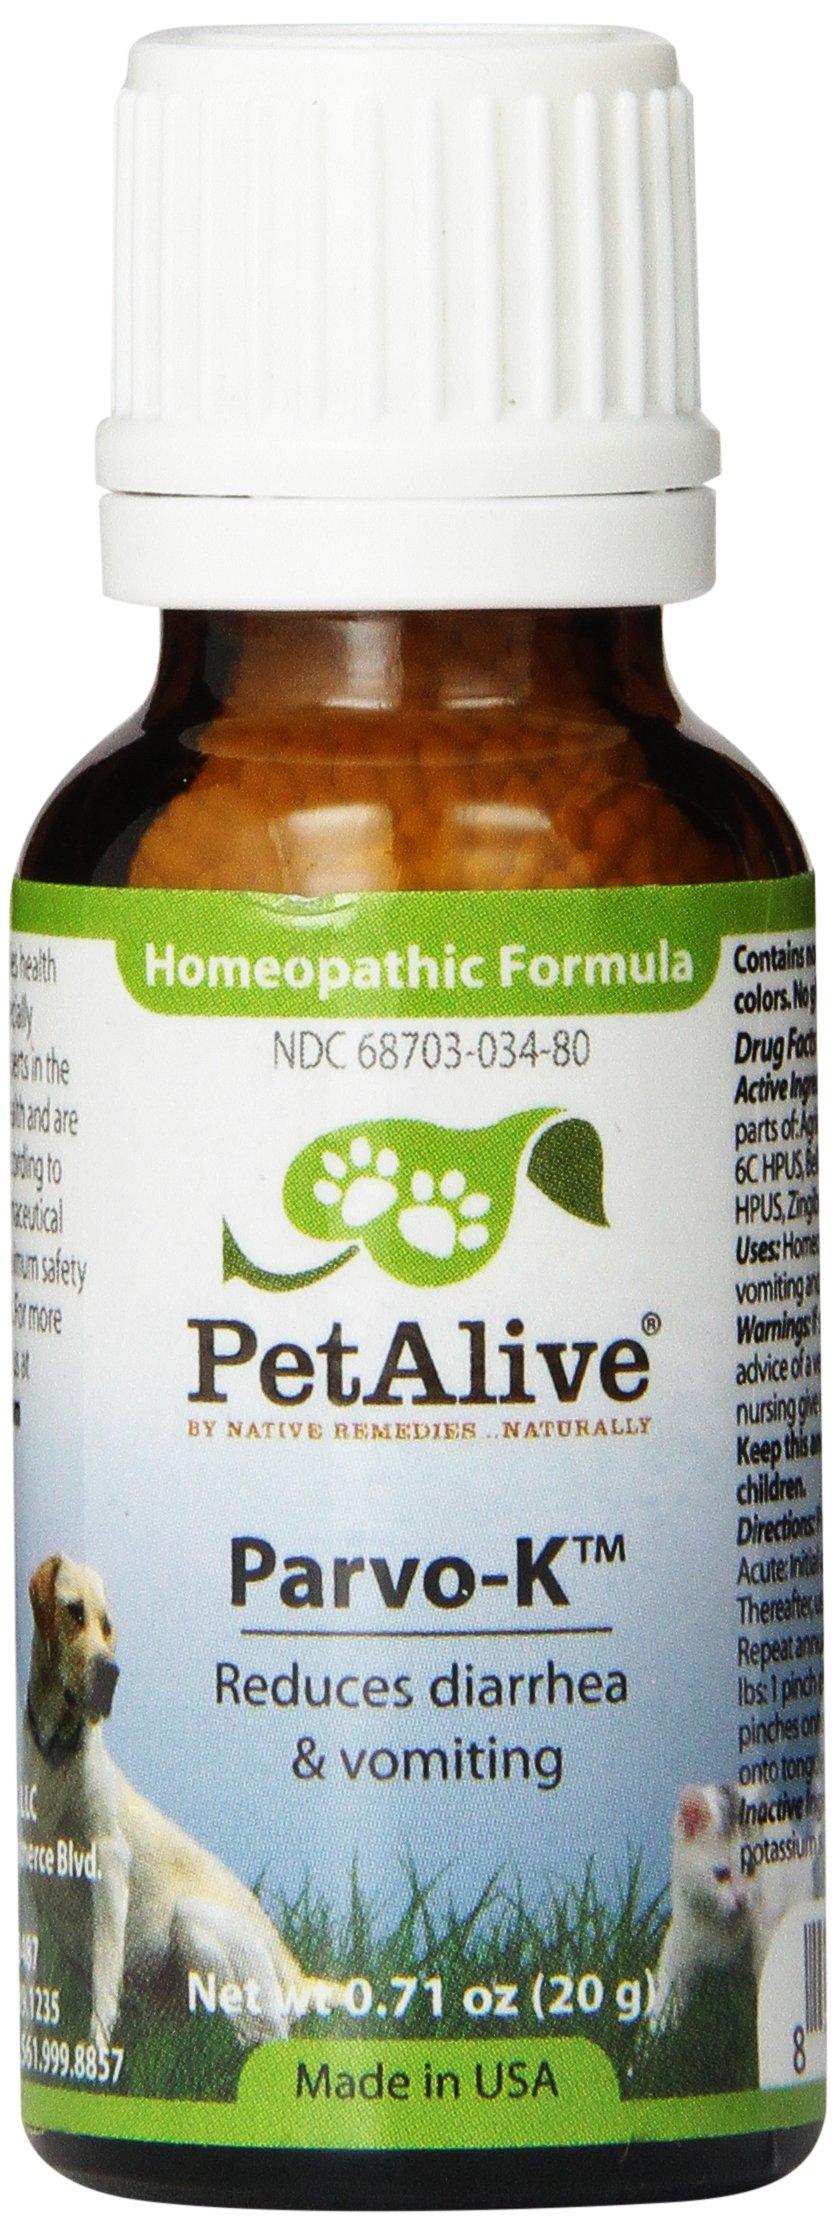 PetAlive Parvo-K for Dogs for Canine Parvo Virus